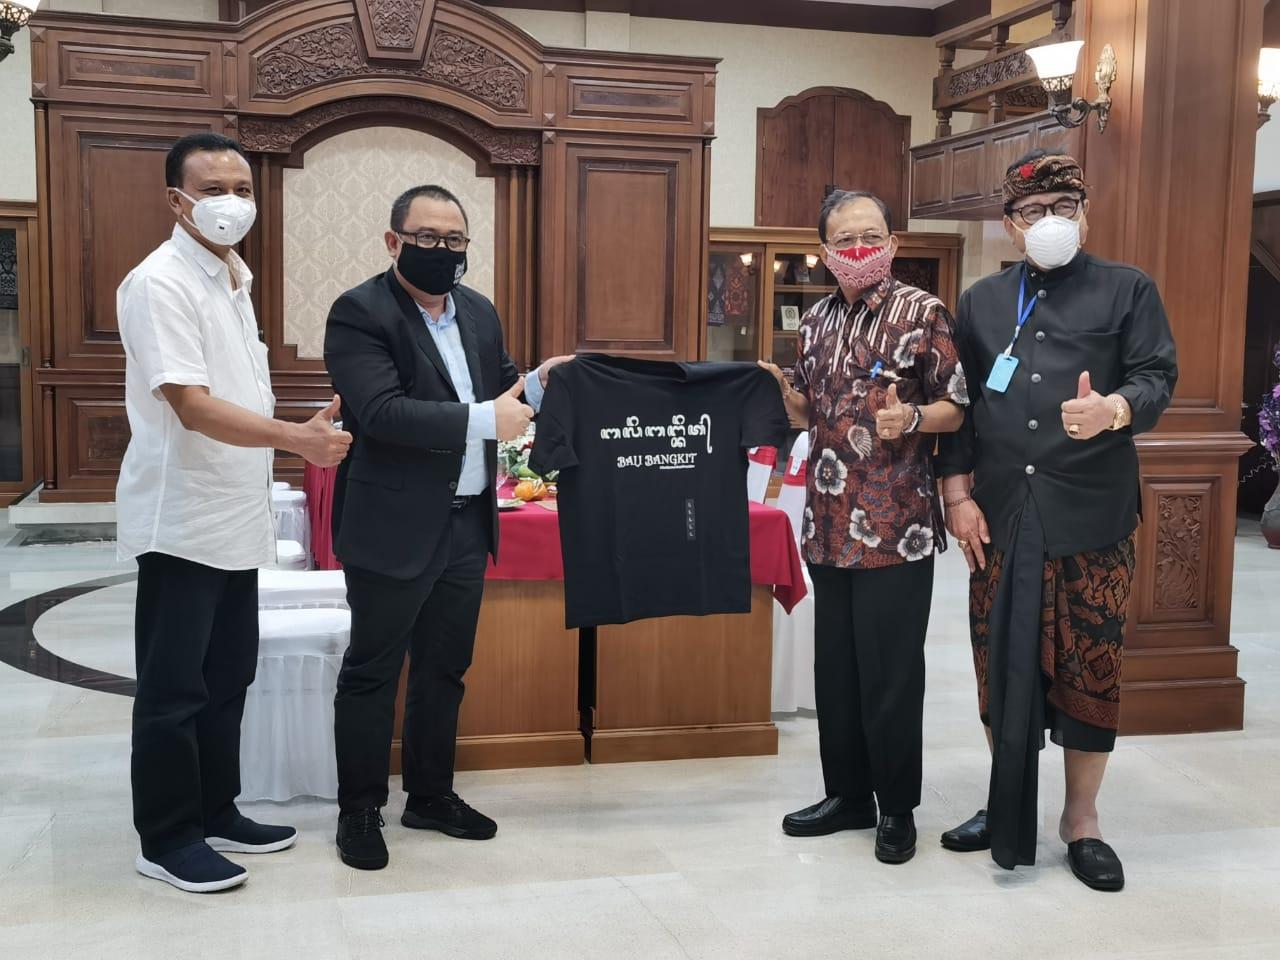 Foto: 02377 Badung Bali Bangkit AAGN Ari Dwipayana bersama Gubernur Wayan Koster dan Wagub Cok Ace. Foto: ist